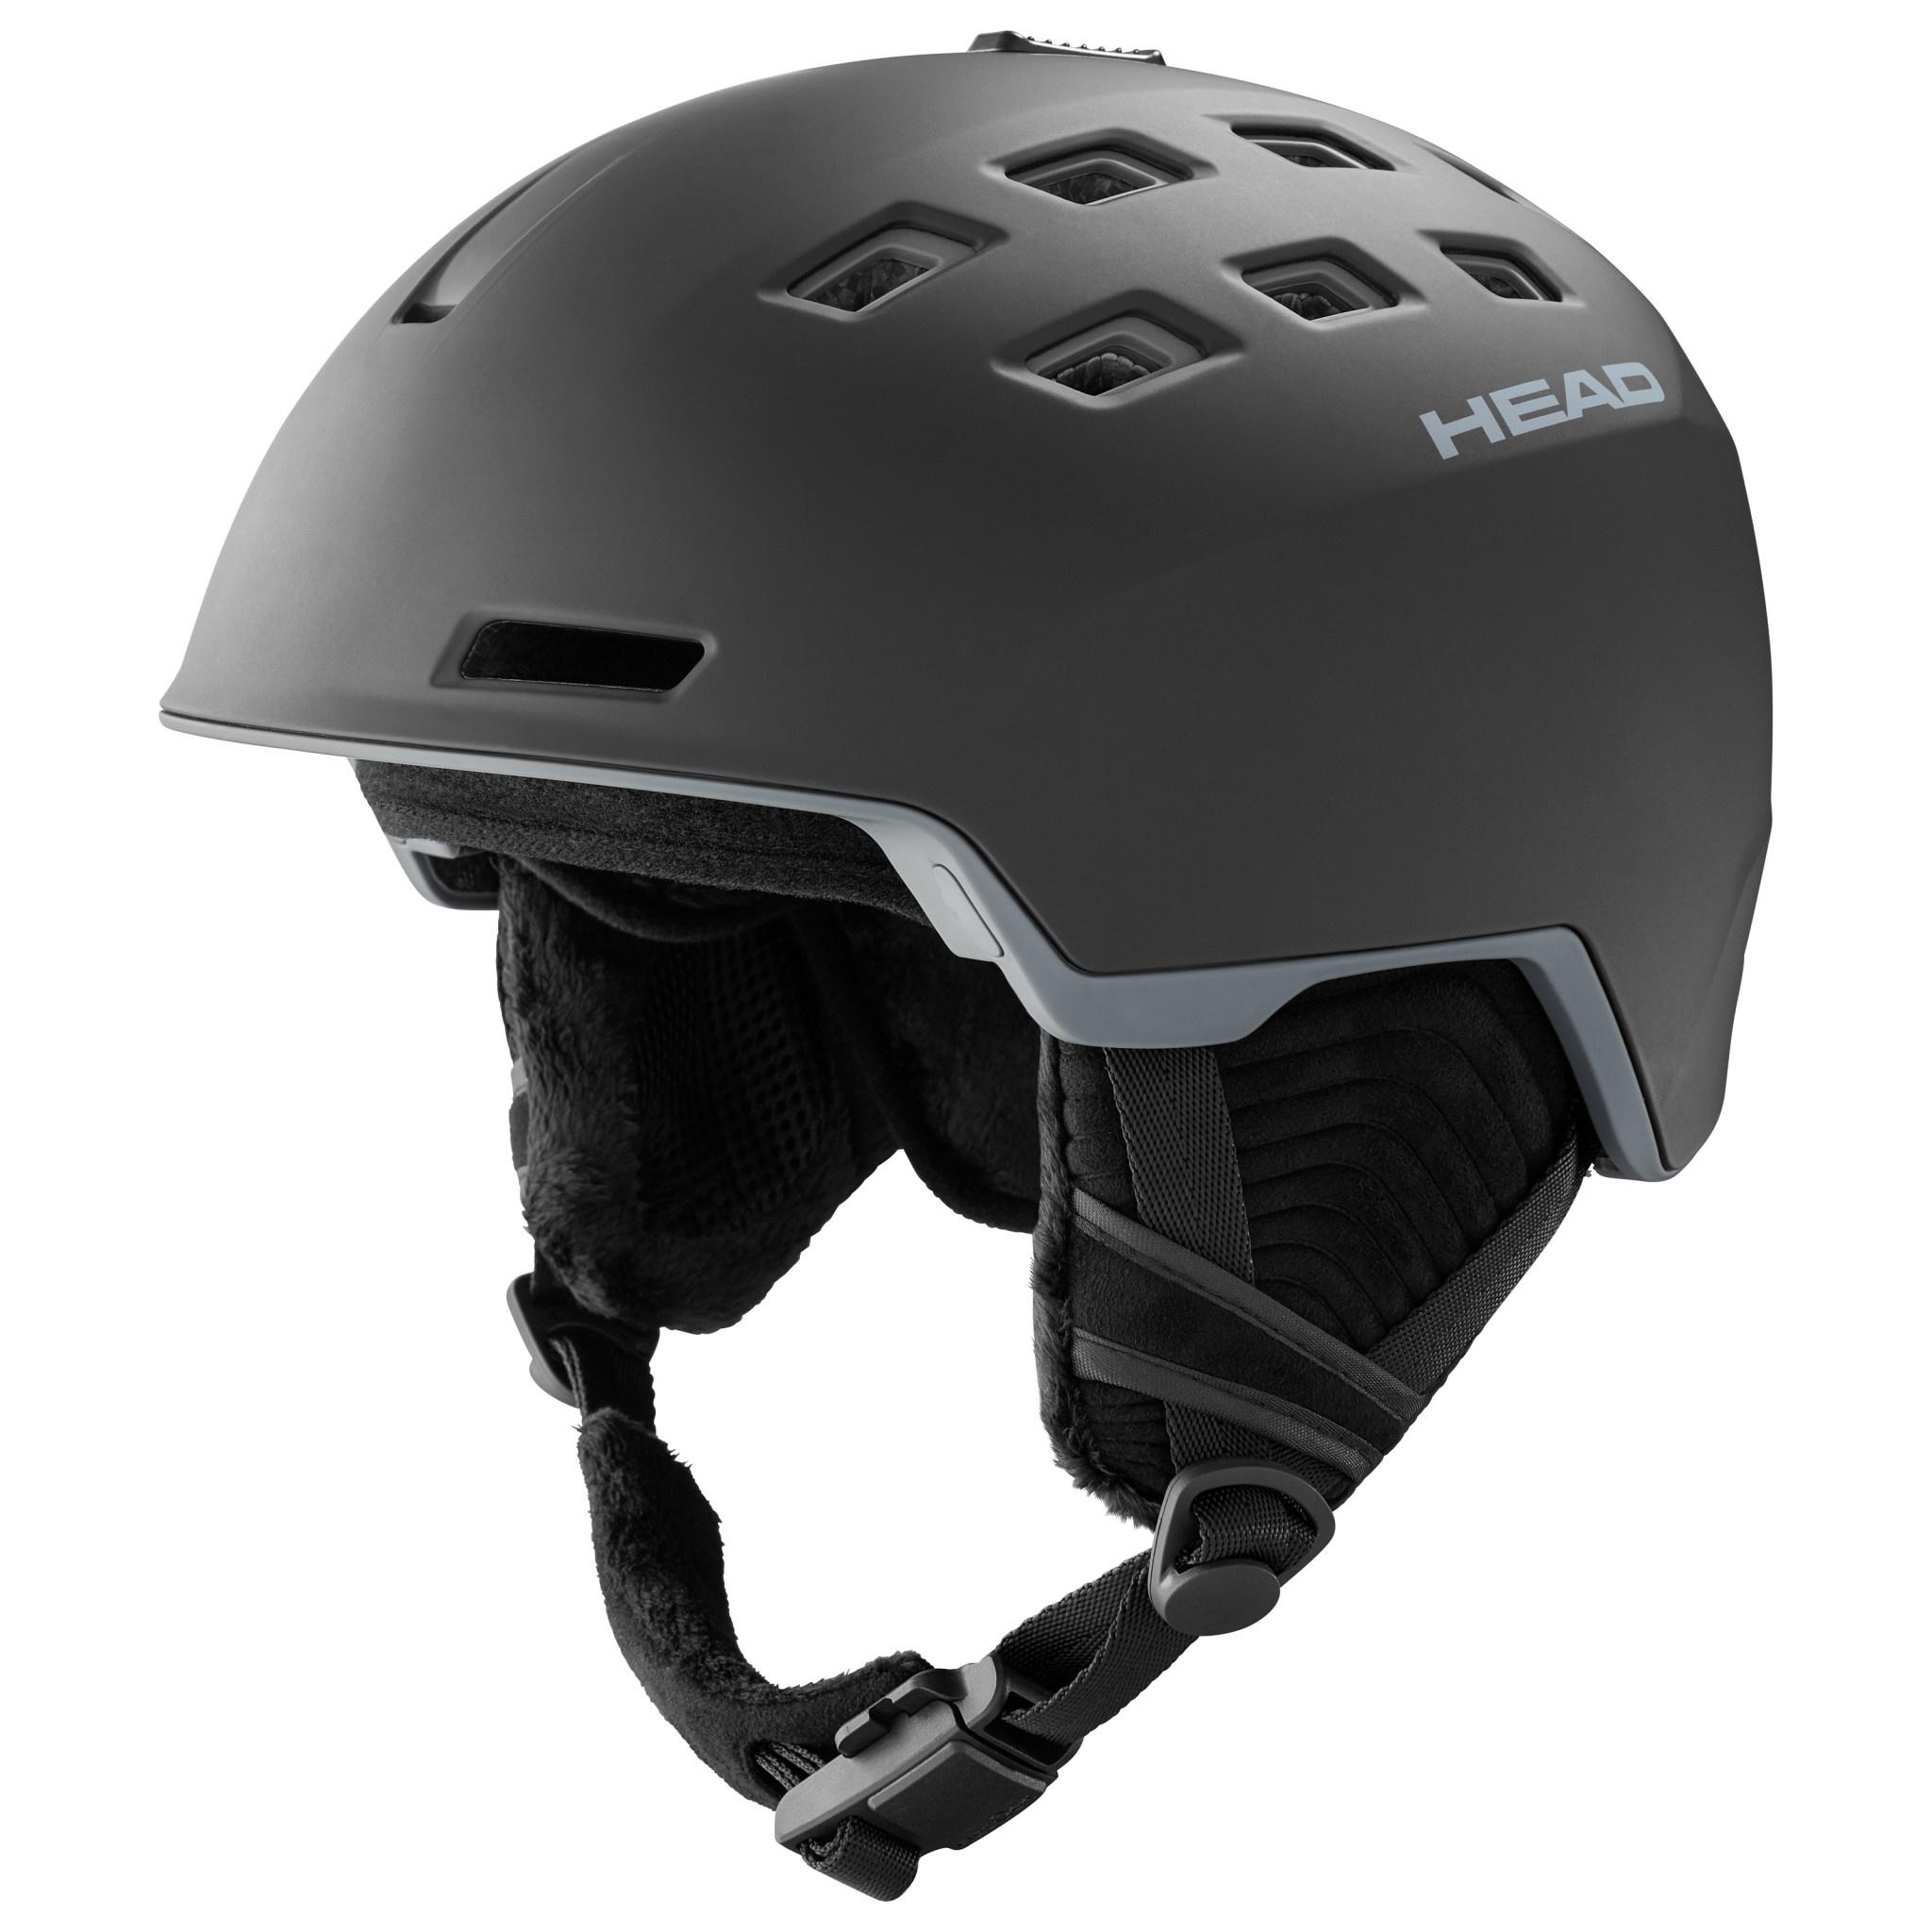 Head Head Rev Snow Helmet